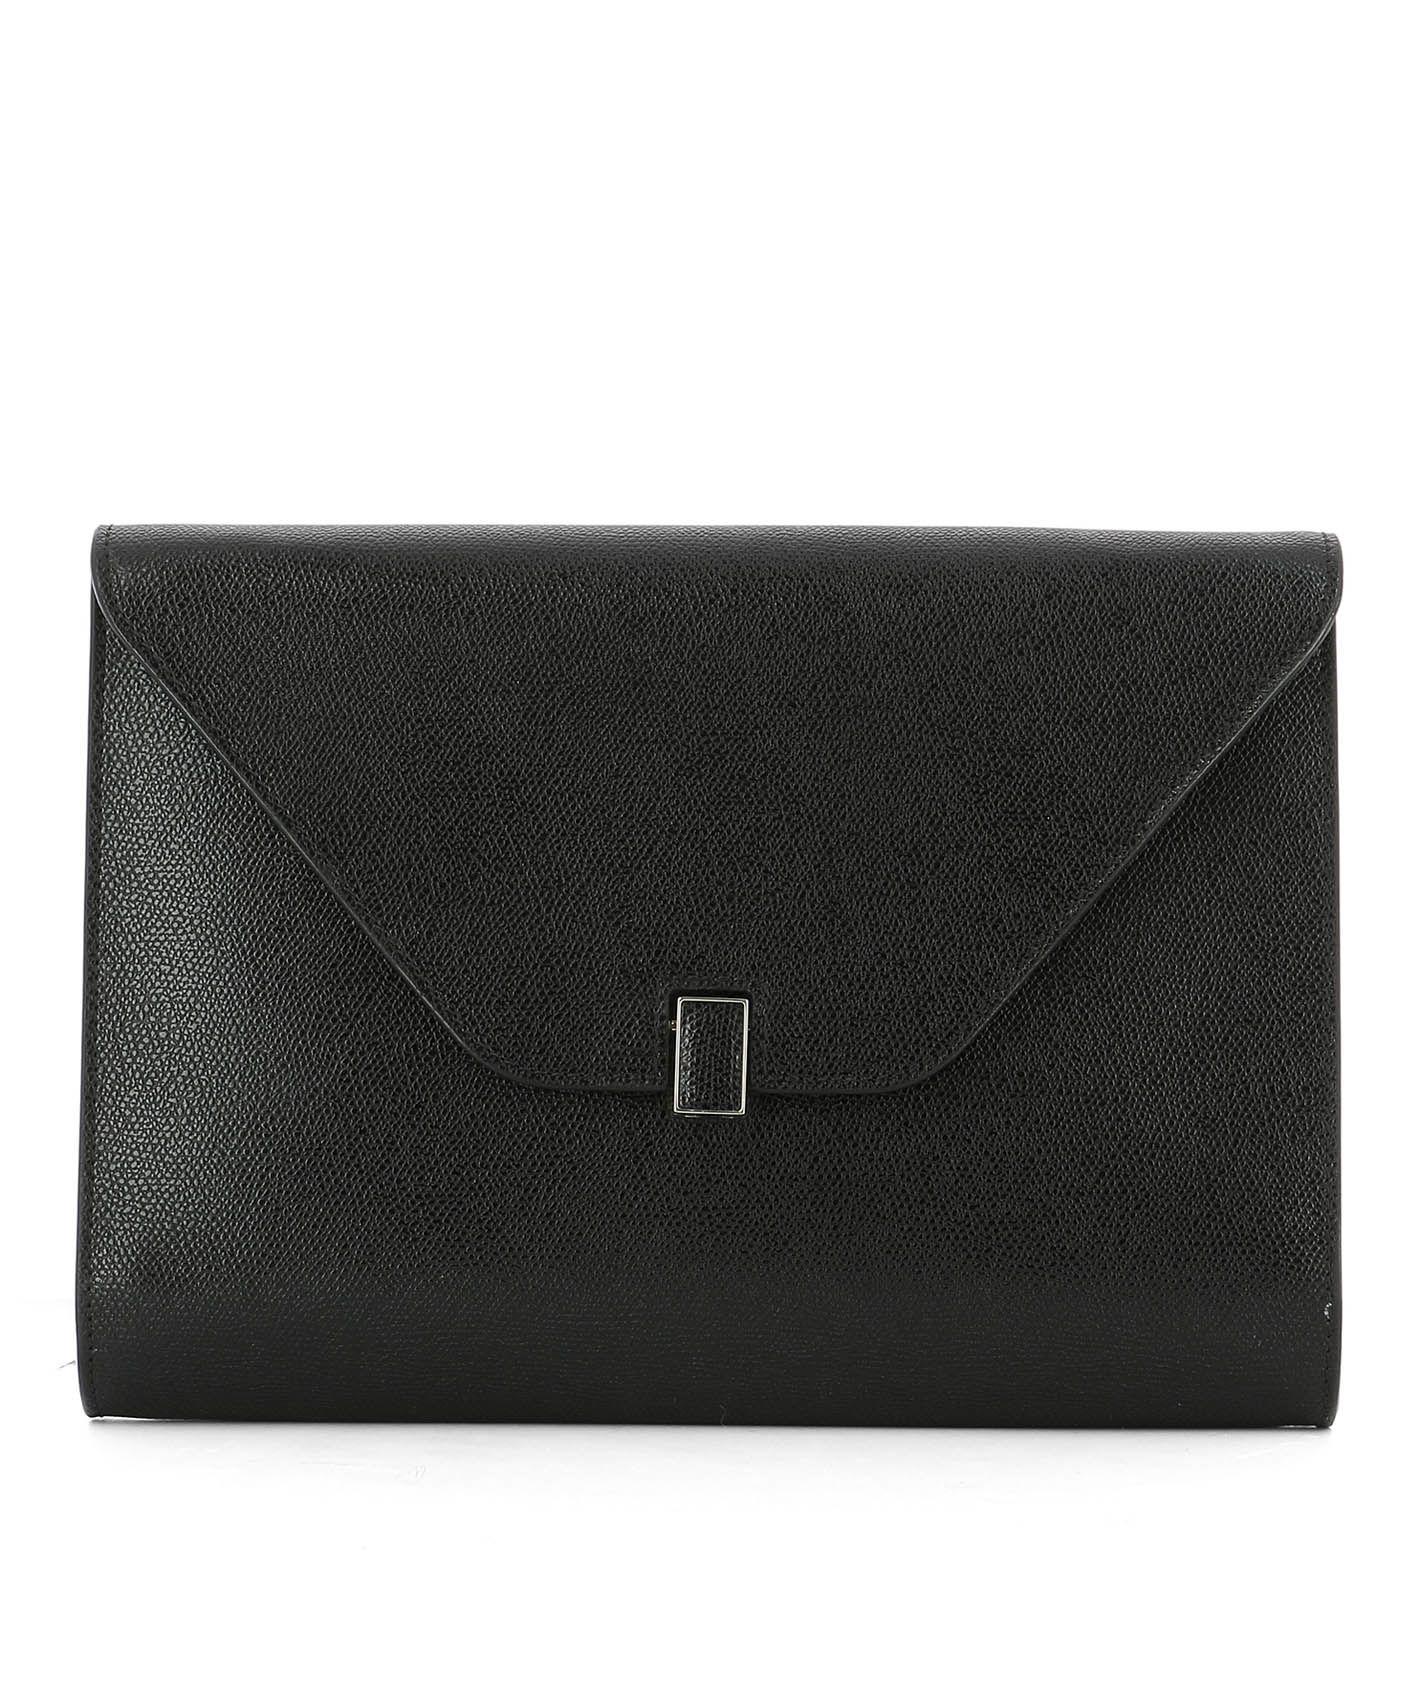 Black Leather Pochette.